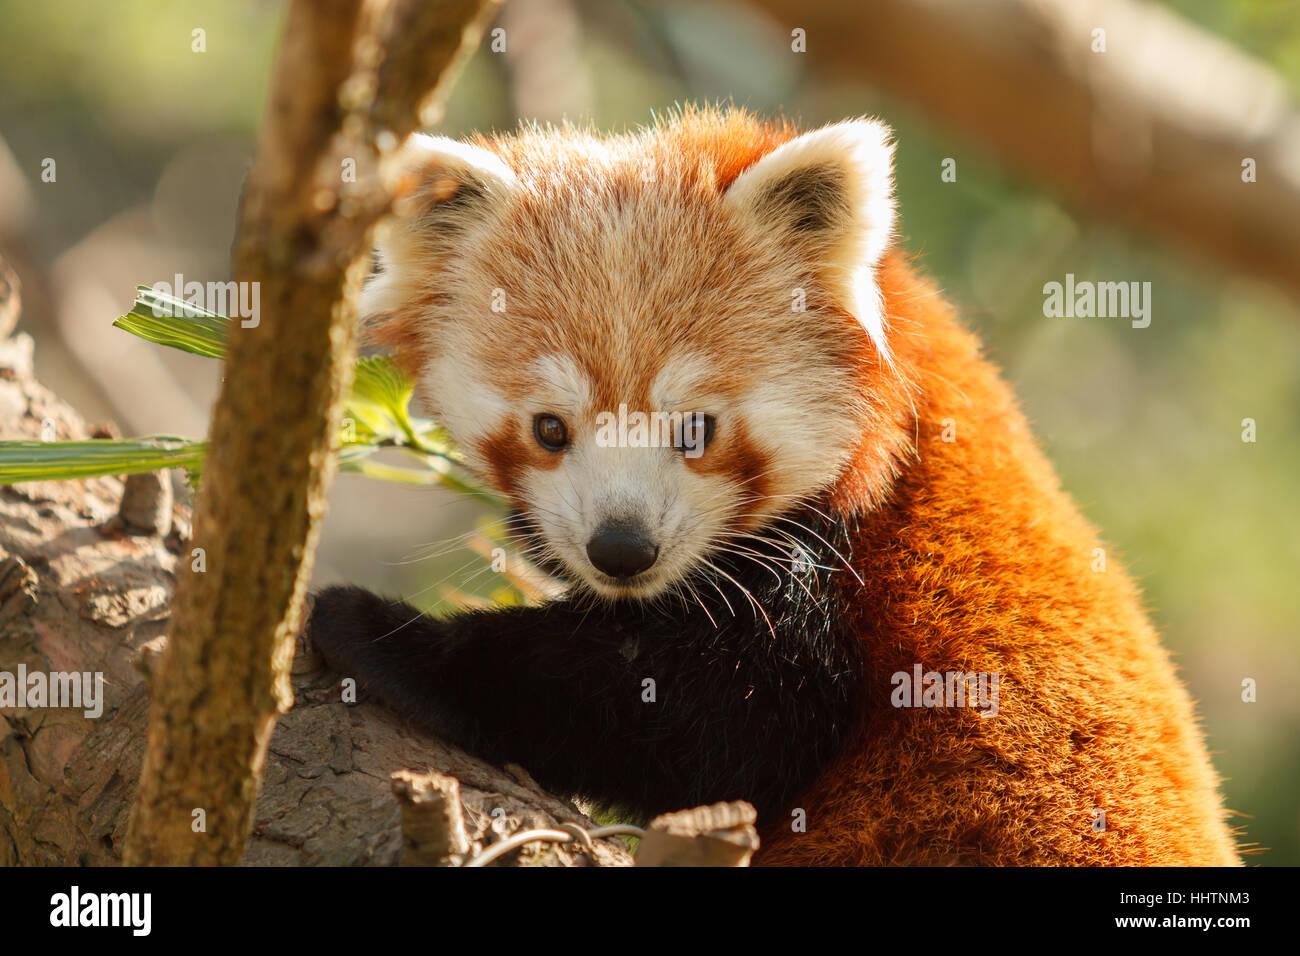 Le chinois ou l'Himalayan Panda rouge Nom latin Ailurus fulgens, aussi connu comme le moindre panda rouge ou Photo Stock